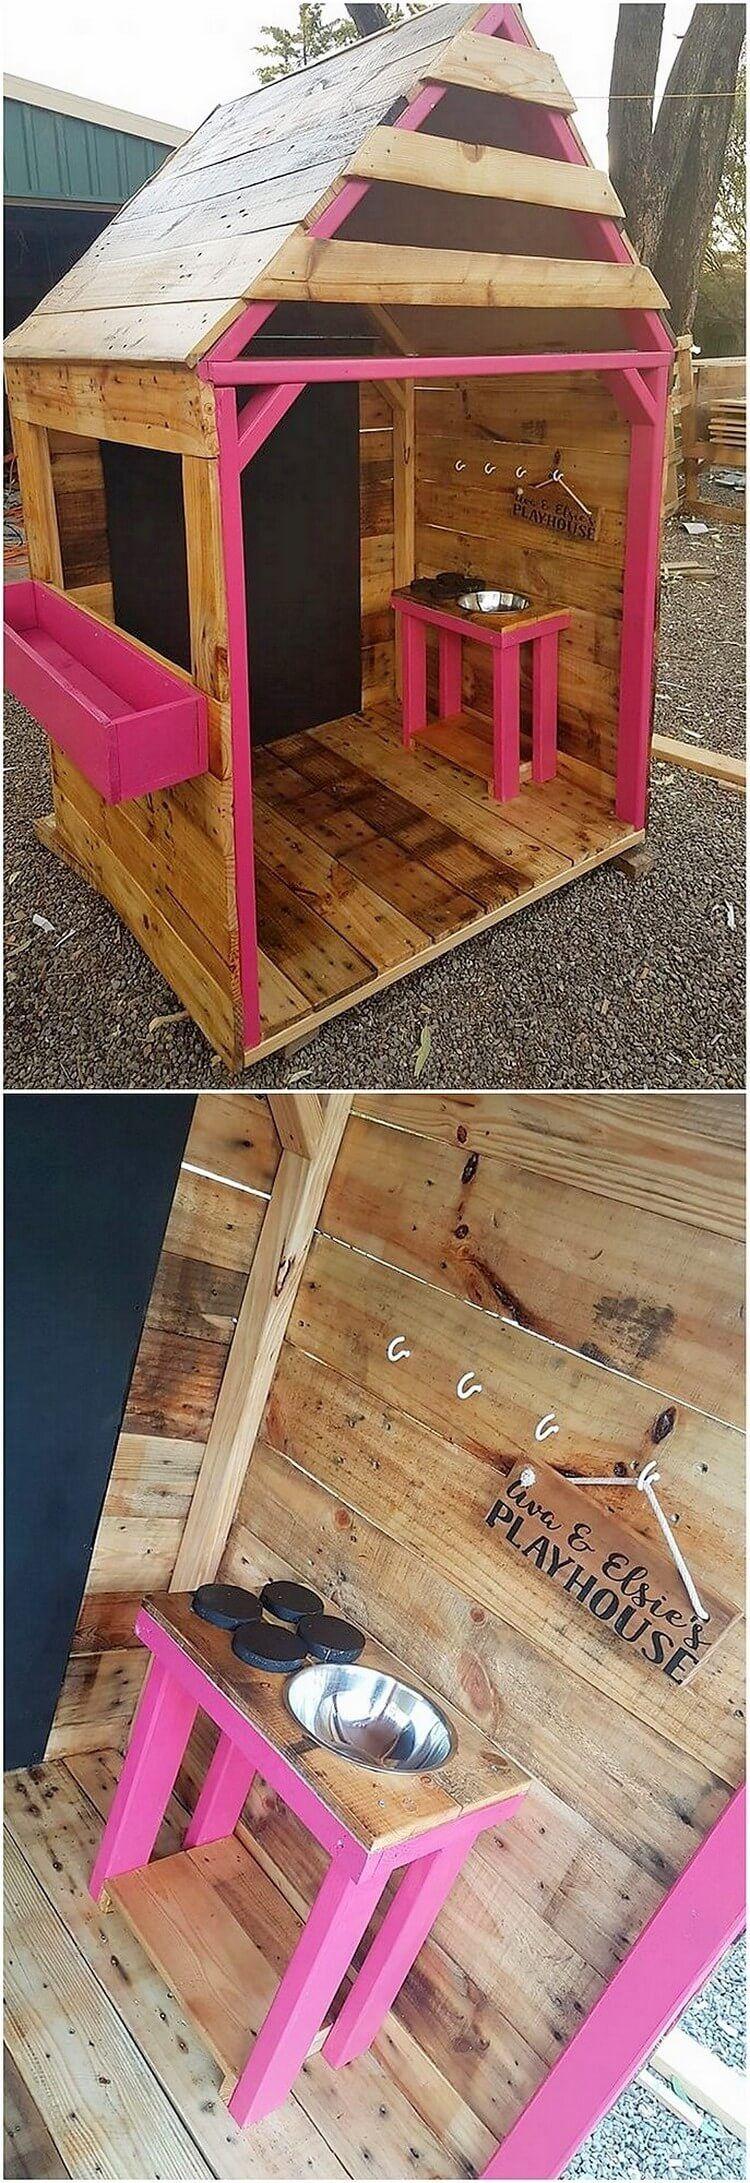 Clever Ideas for Reusing Wasted Wood Pallets | Spielhaus garten ...